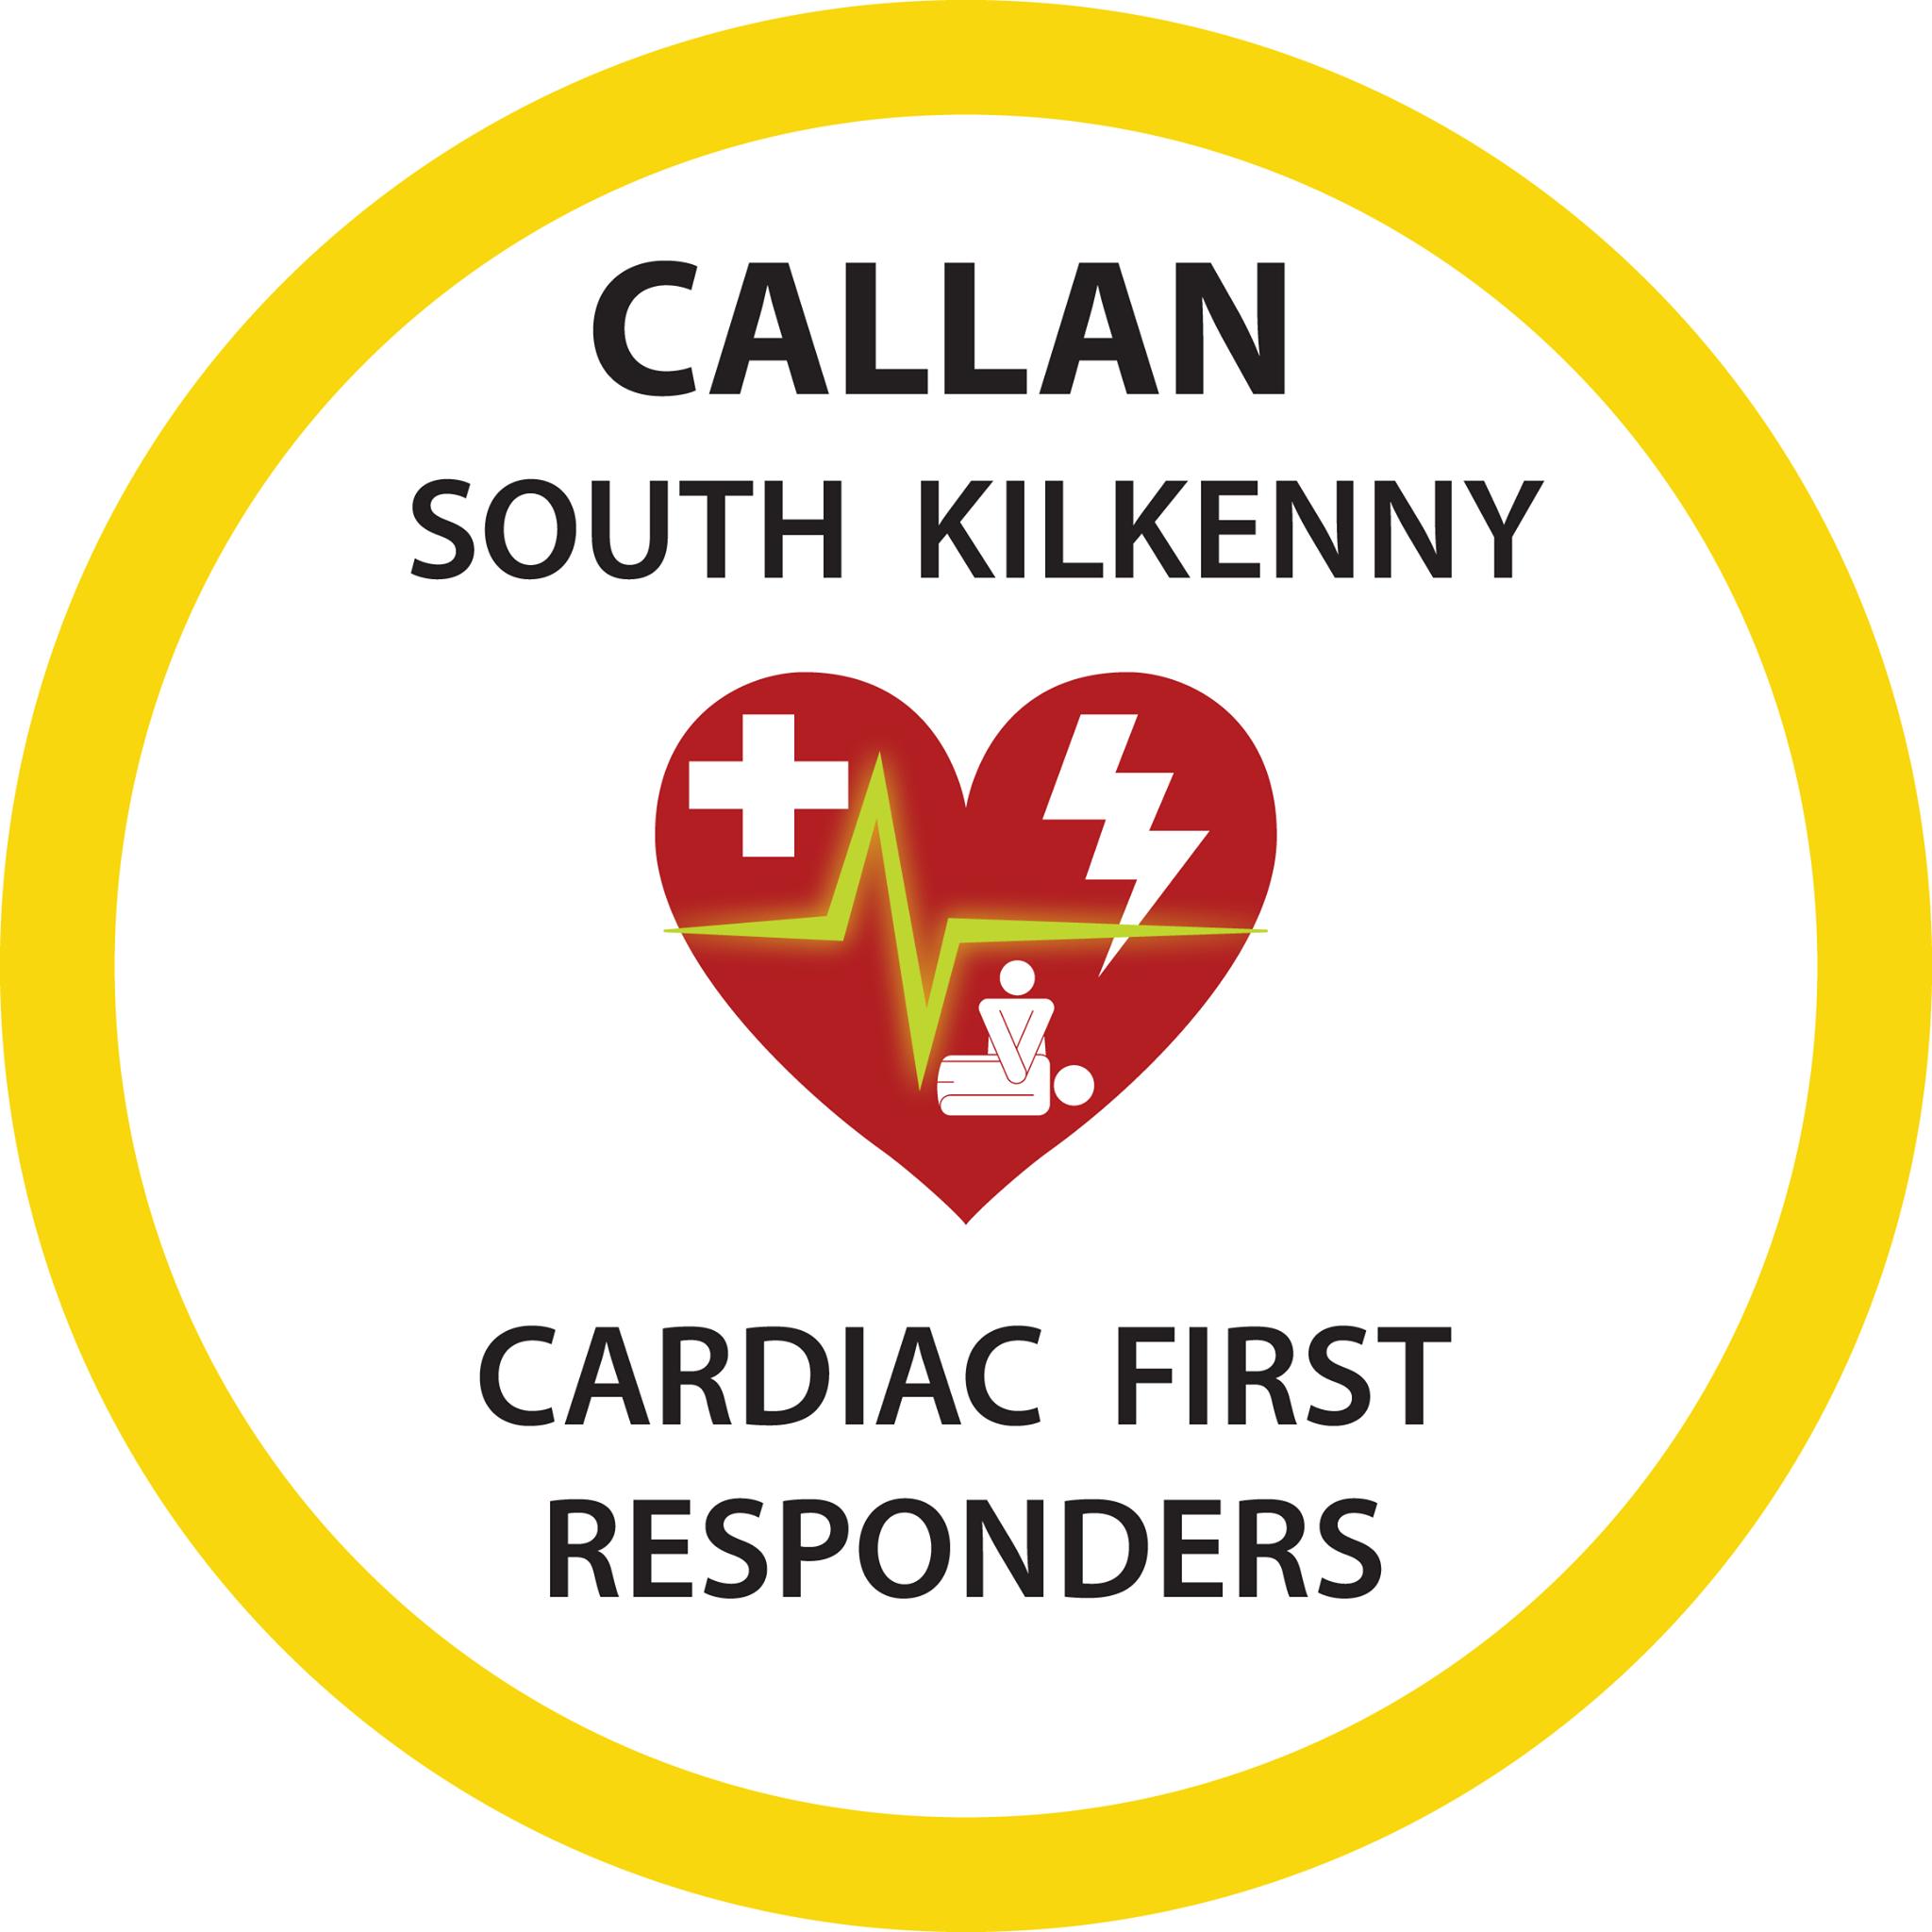 Callan Cardiac First Responders